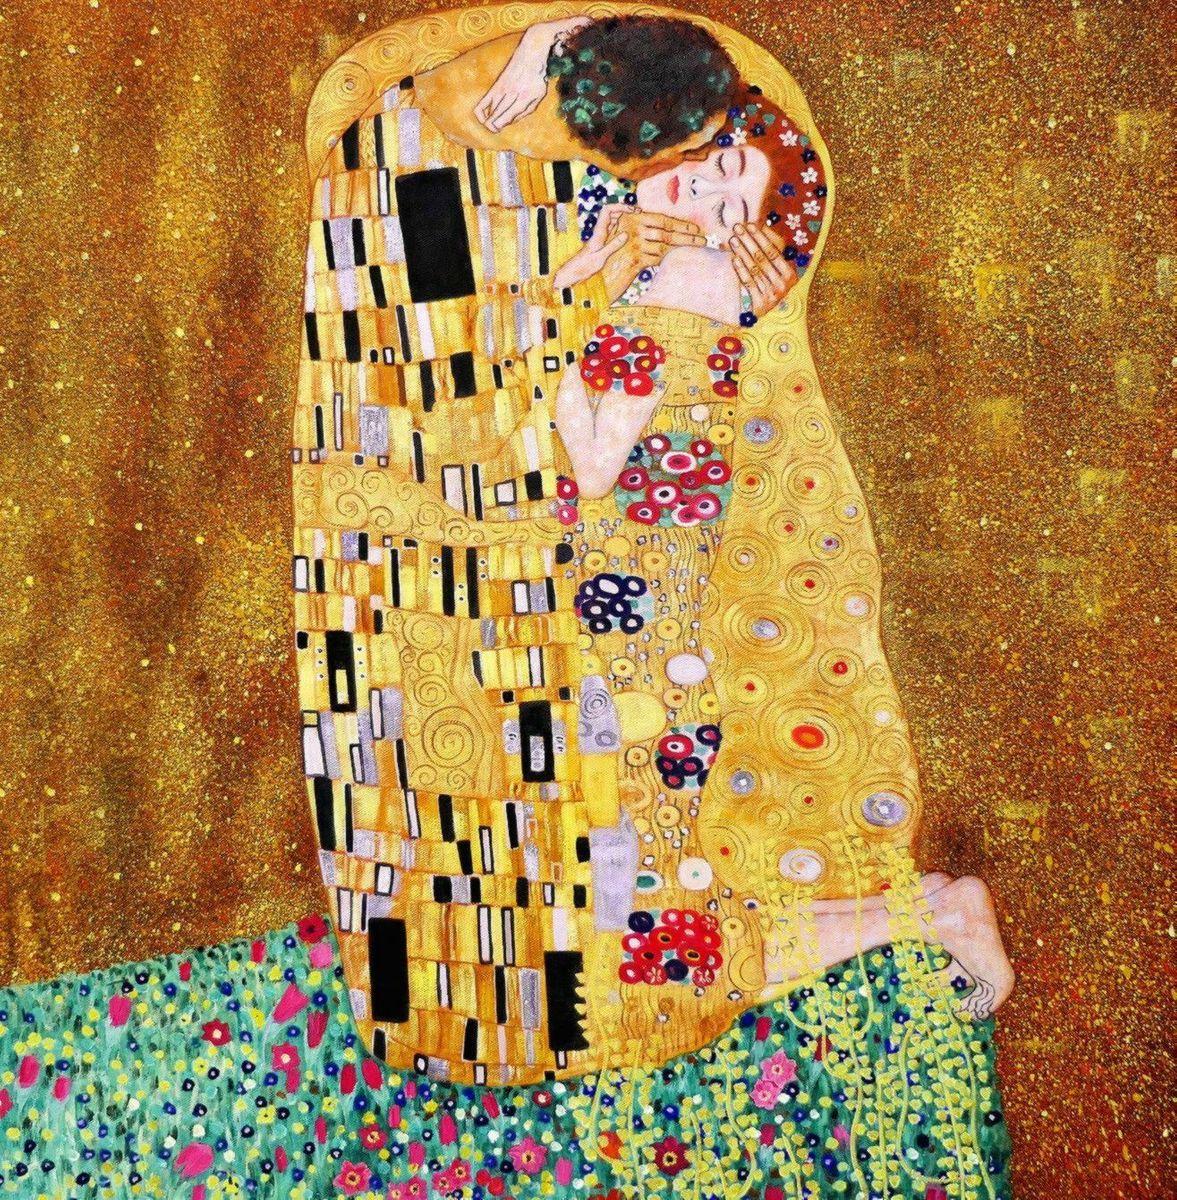 Gustav Klimt - Der Kuss g97225 80x80cm Jugendstil Ölgemälde handgemalt Museumsqualität